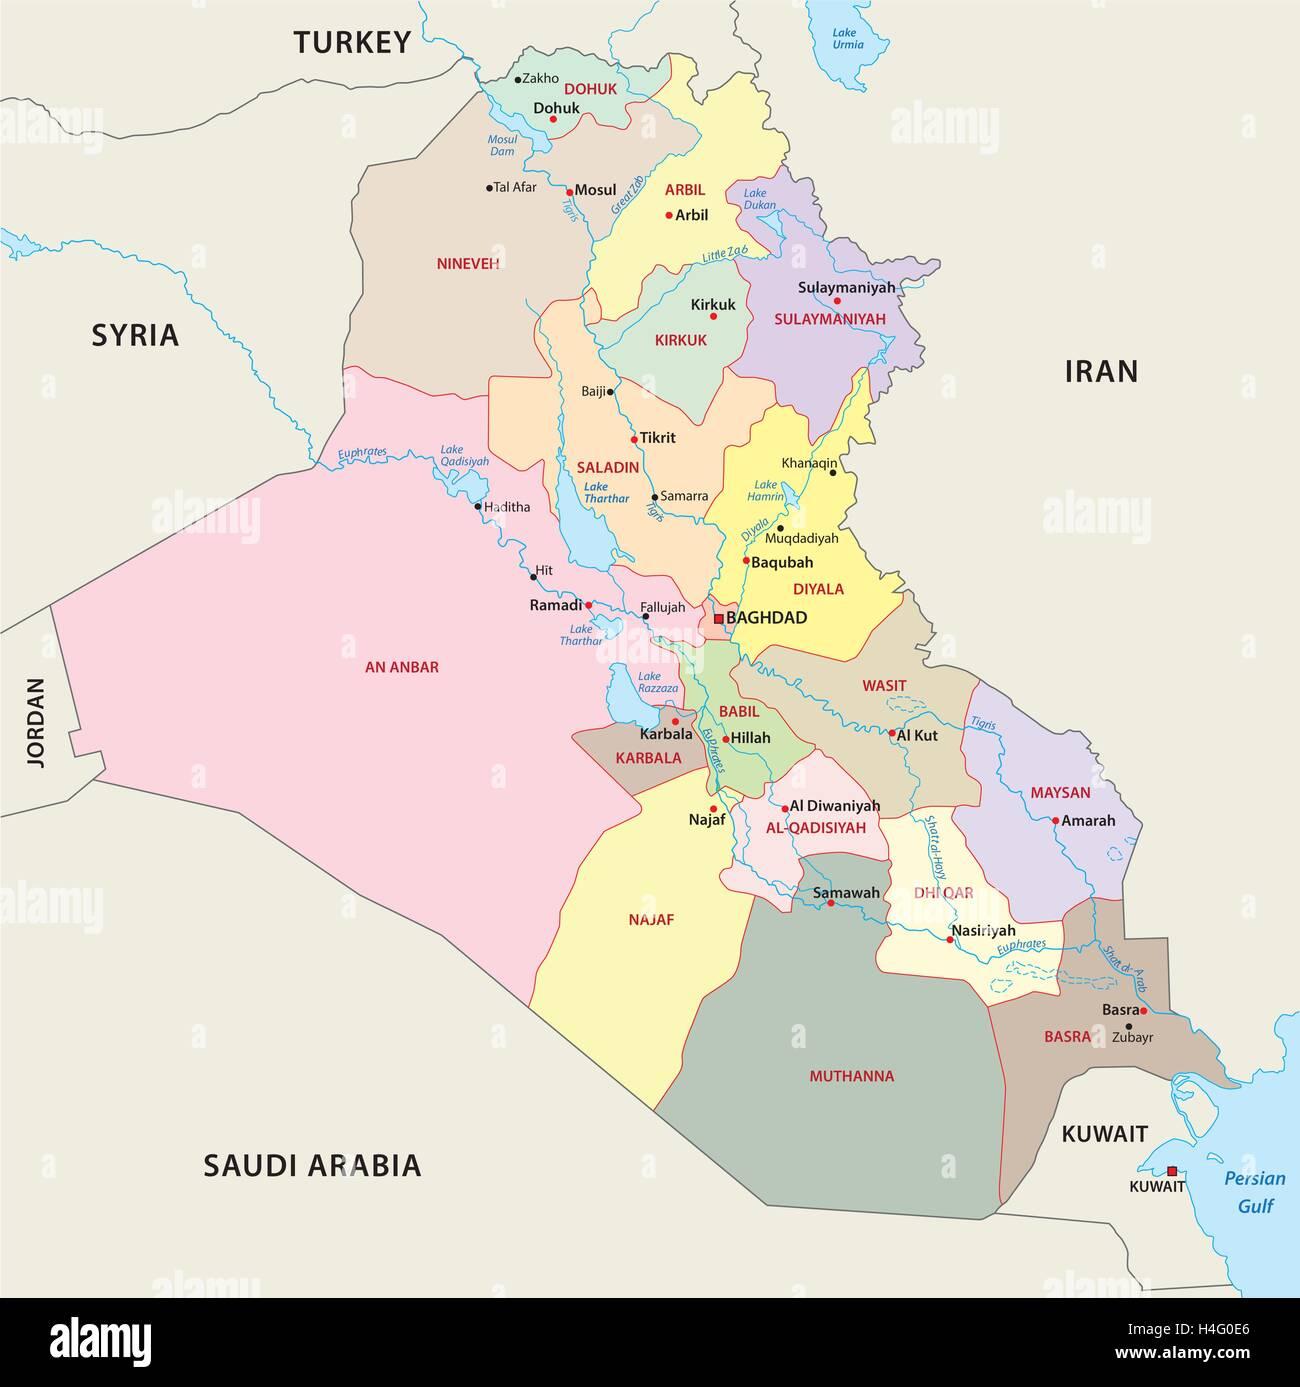 Iraq administrative divisions map Stock Vector Art Illustration